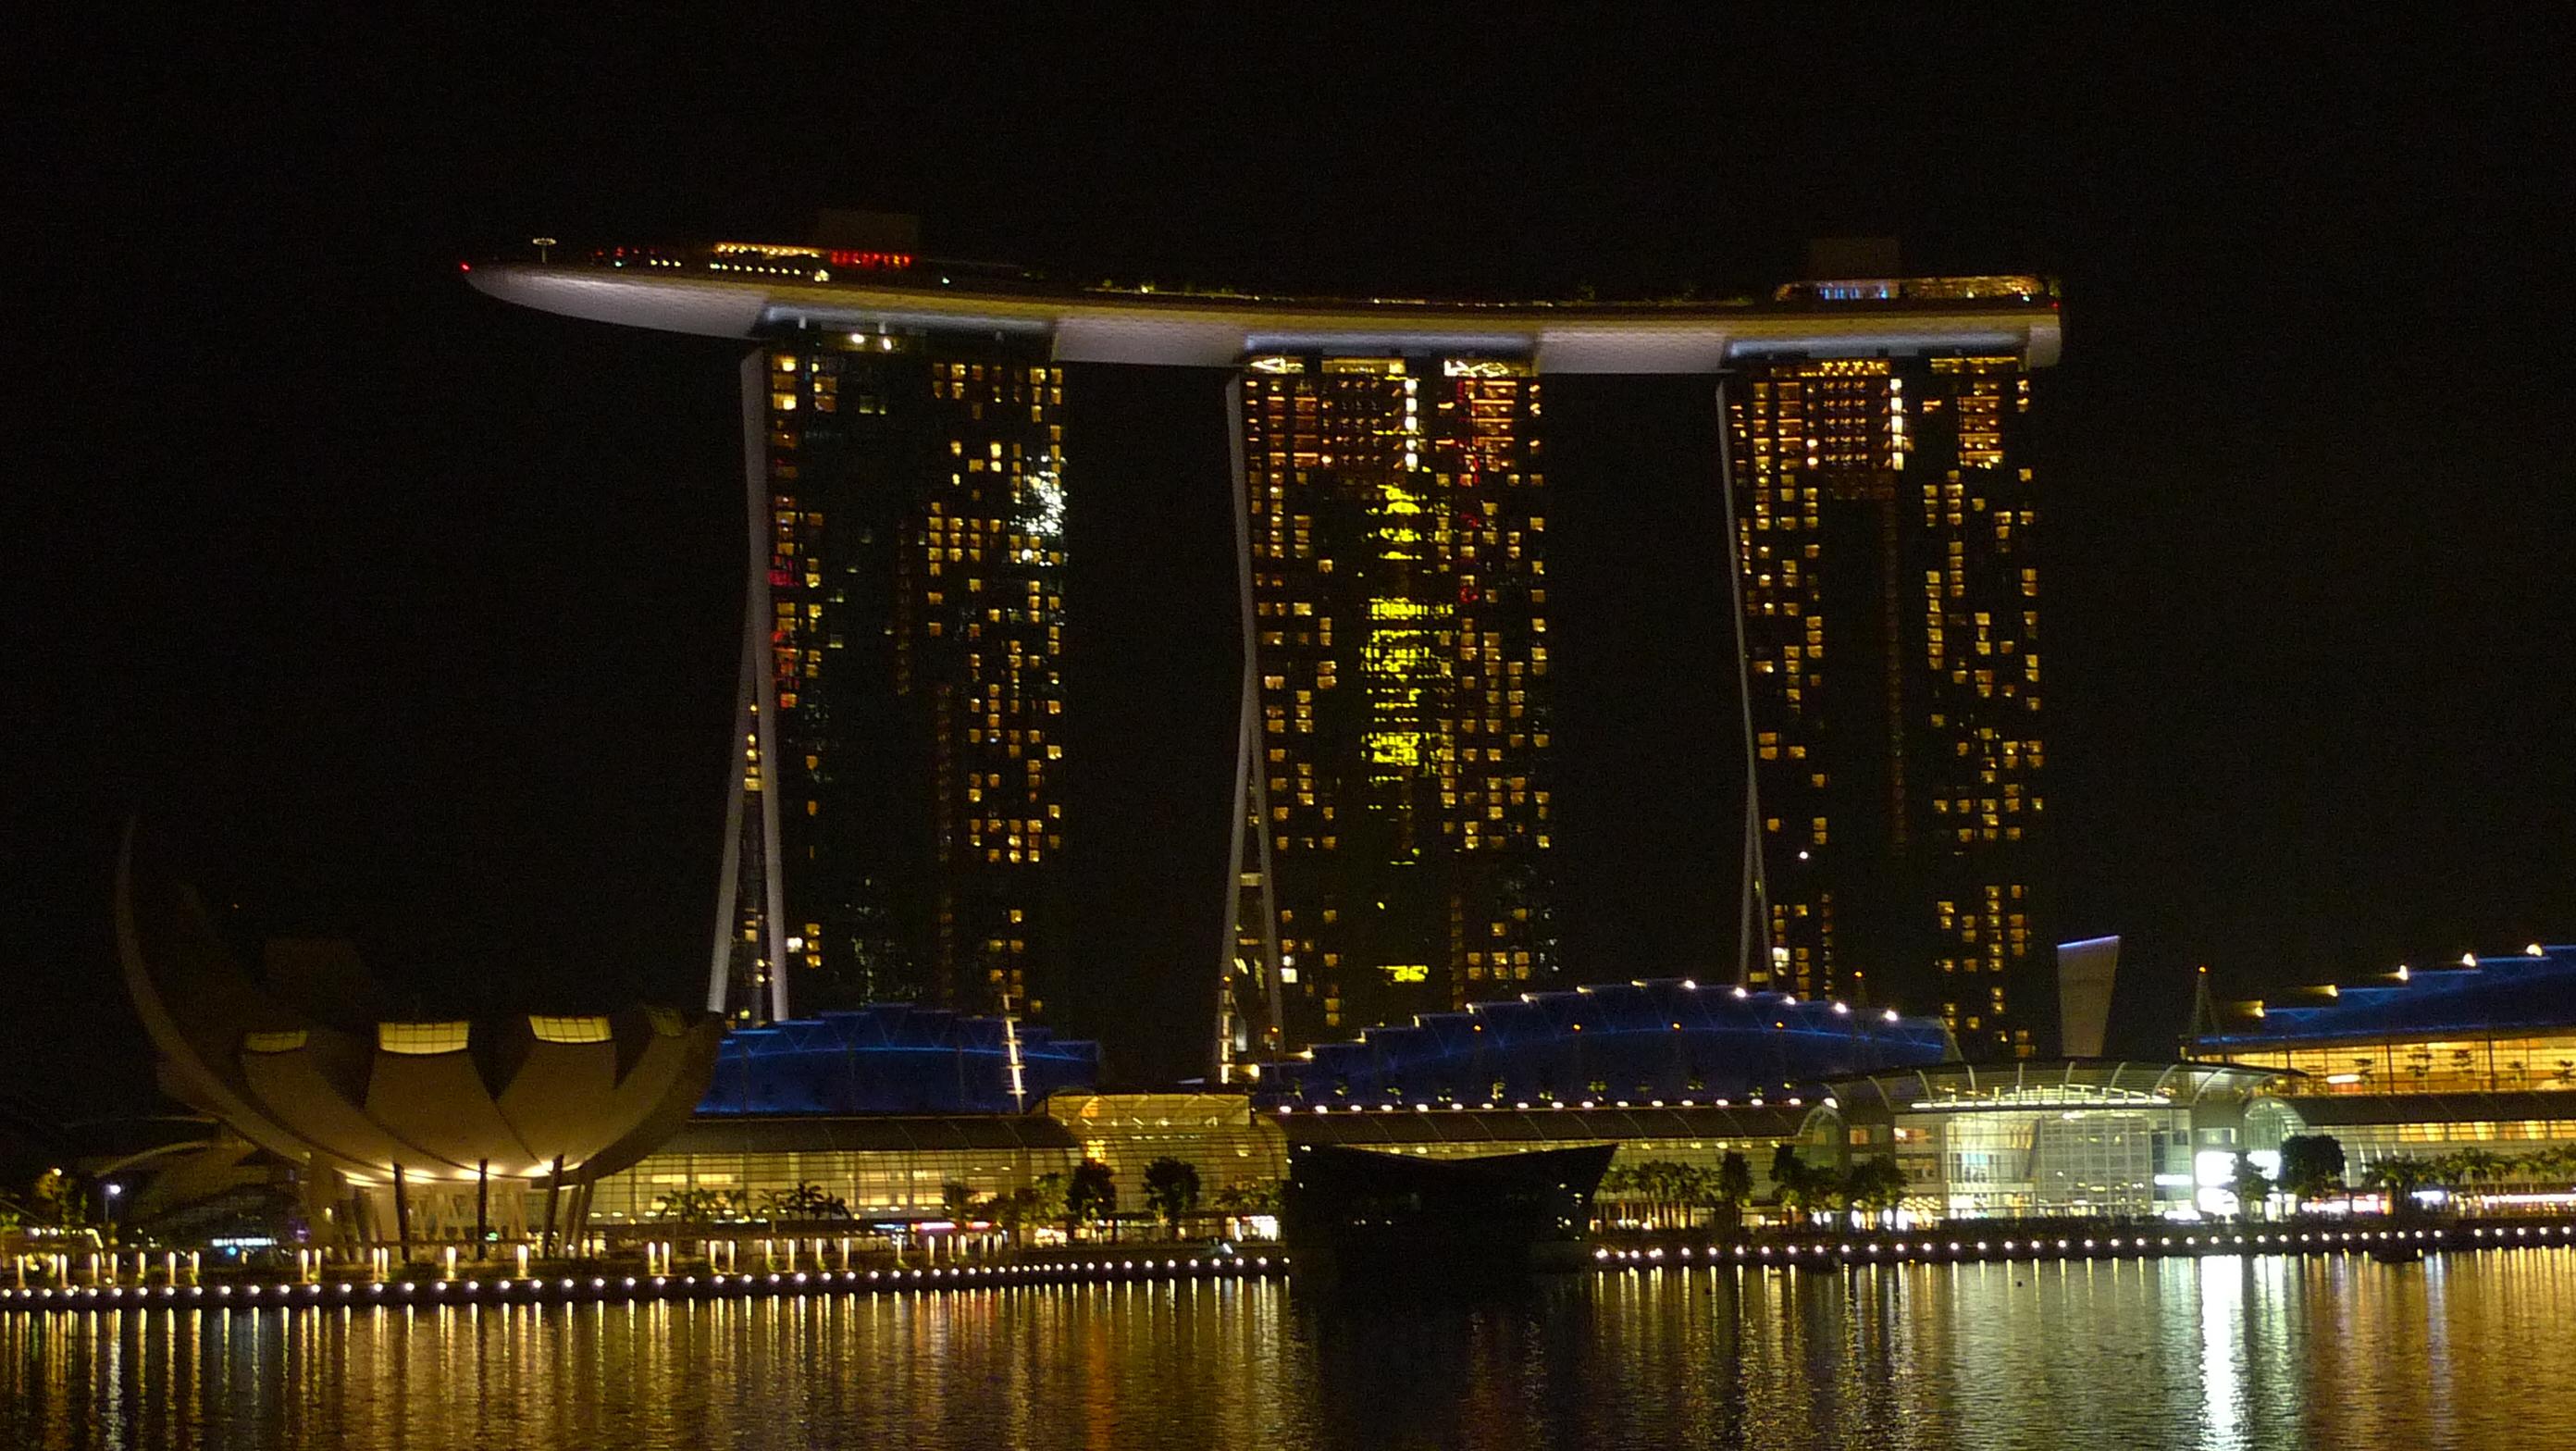 marina bay sands singapore(新加坡滨海湾金沙大酒店)